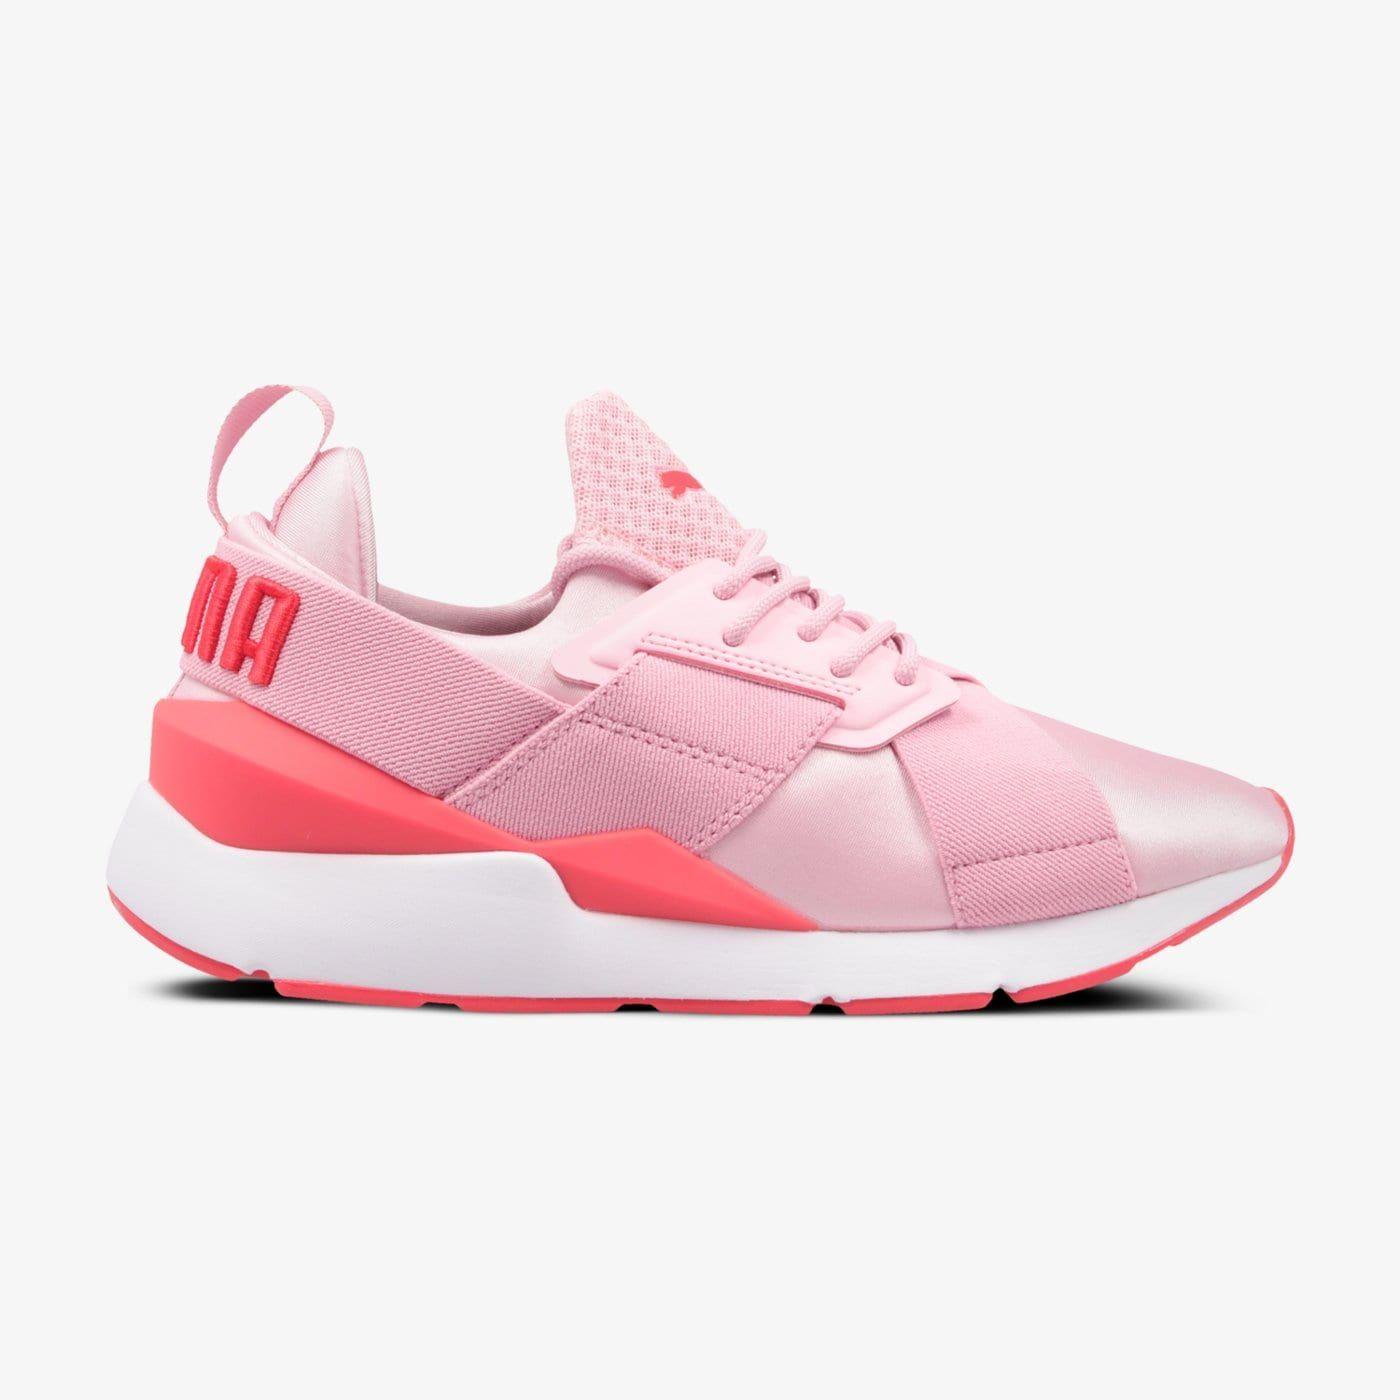 Buty Sneakersy Dla Dzieci Puma Muse Jr 36764505 Kolor Rozowy Puma Puma Fierce Sneaker Top Sneakers